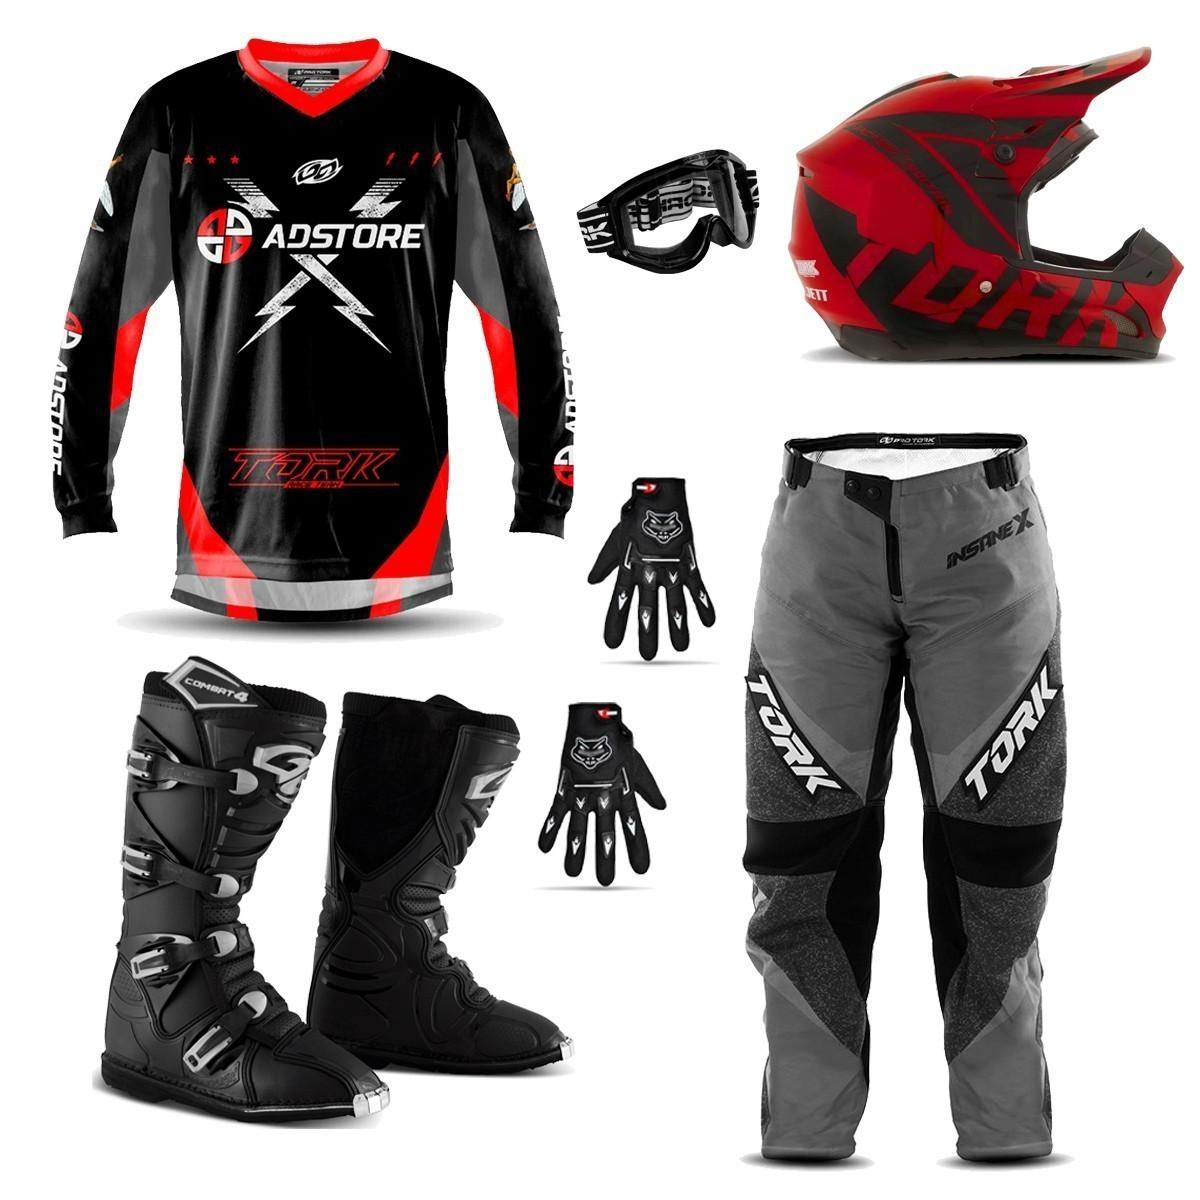 Kit Conjunto Equipamento Motocross Trilha Ad Store X Vermelho Factory Edition